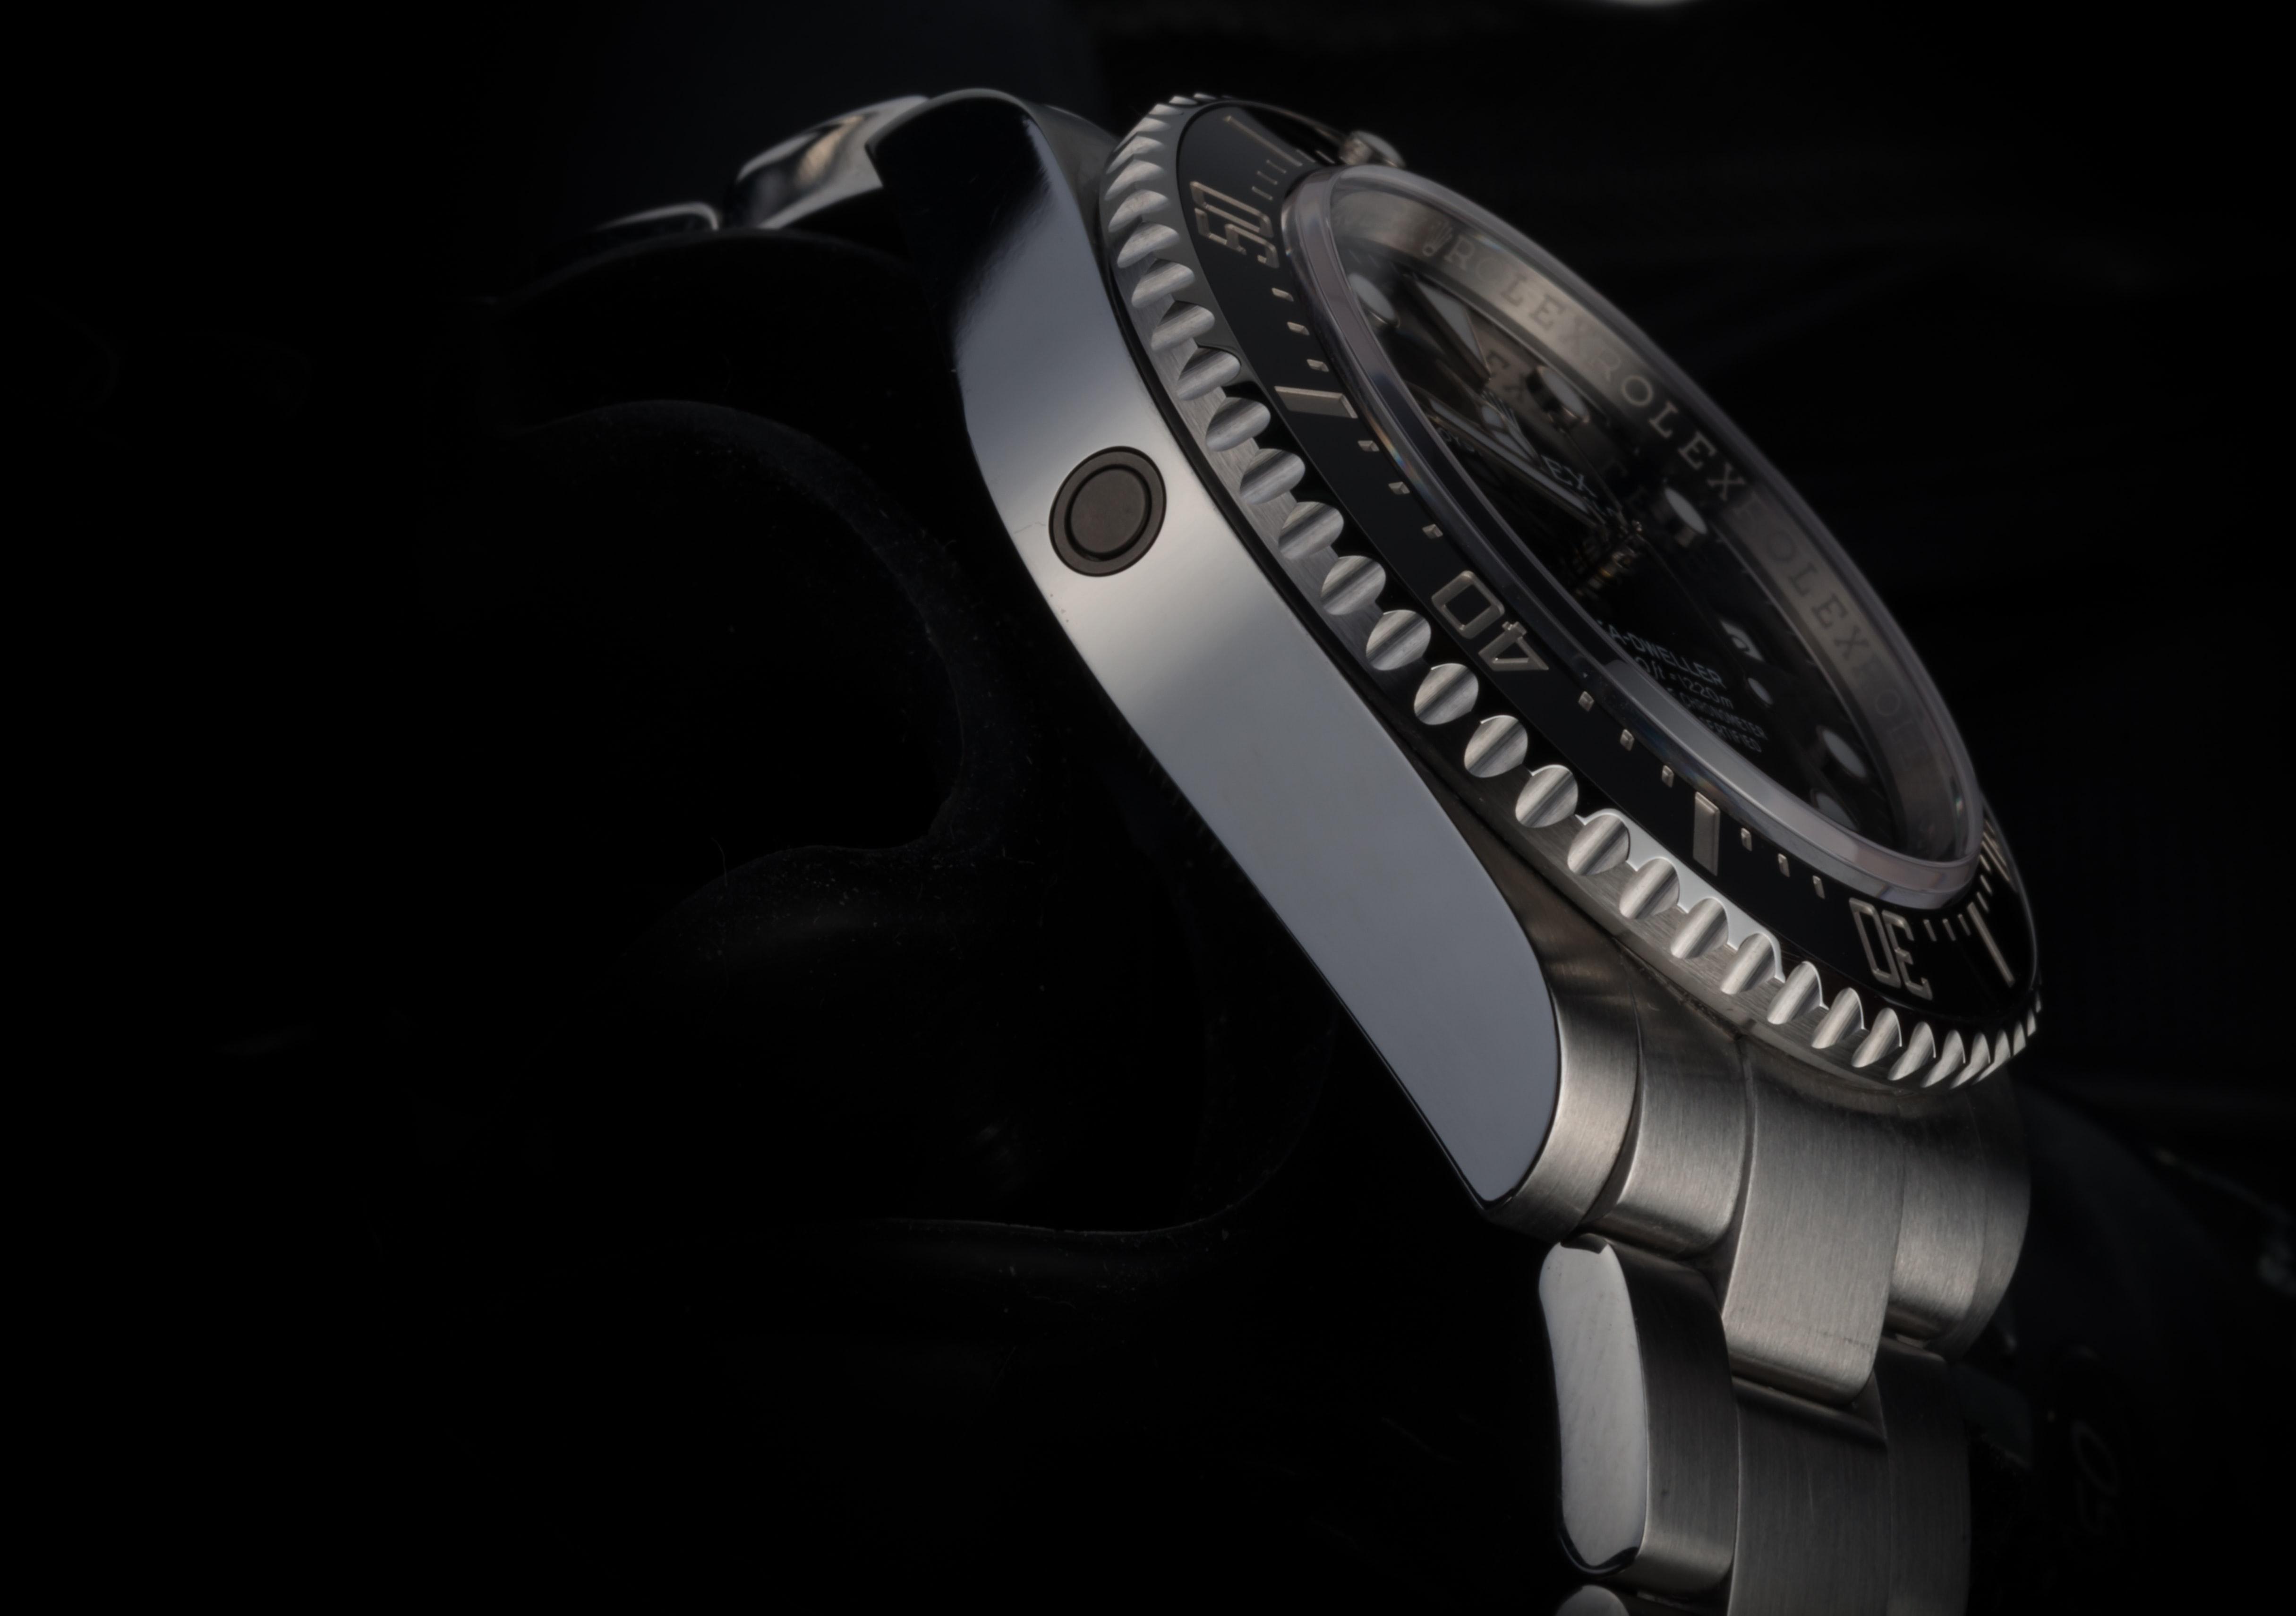 Rolex Sea Dweller  In-Depth: Seven Dive Watch Myths Deep-Sixed Hevalve Rolex